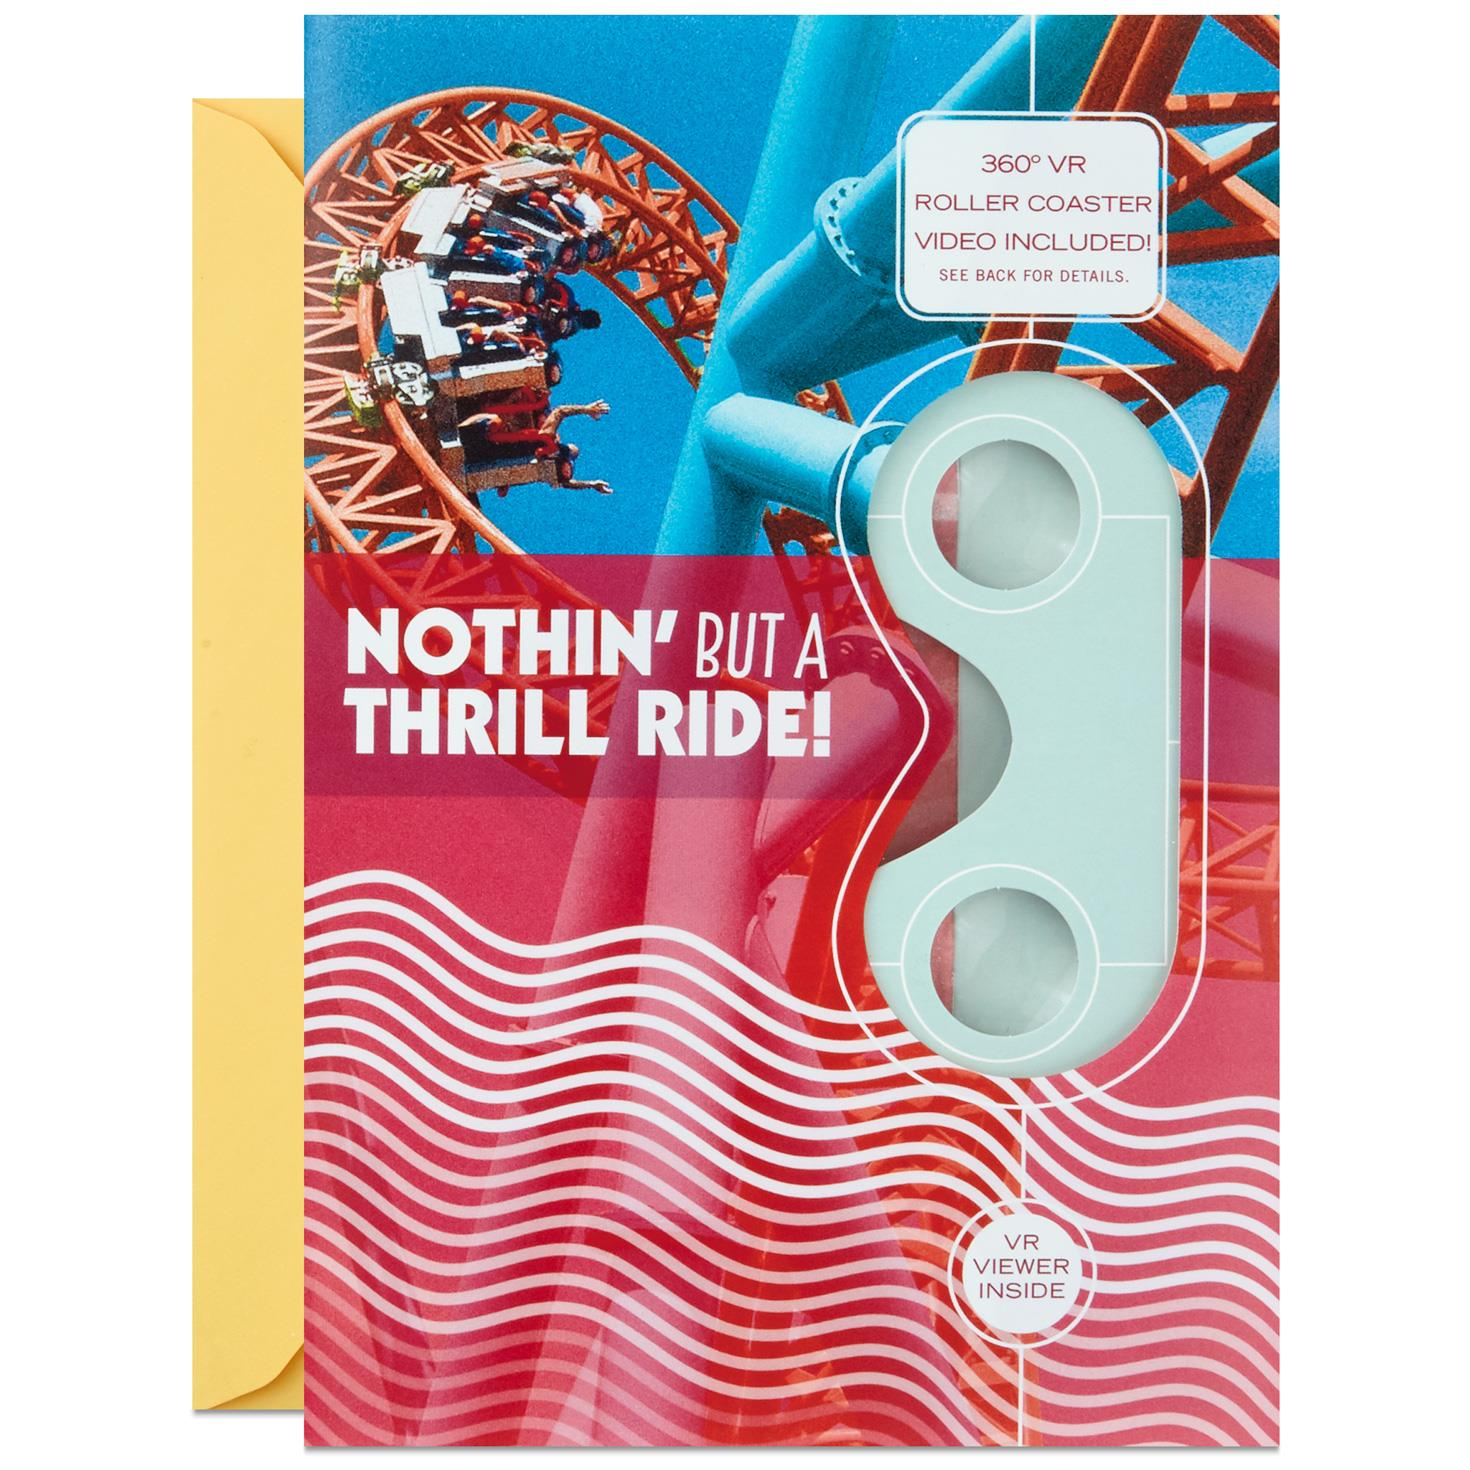 Thrill Ride Roller Coaster VR Birthday Card Greeting Cards